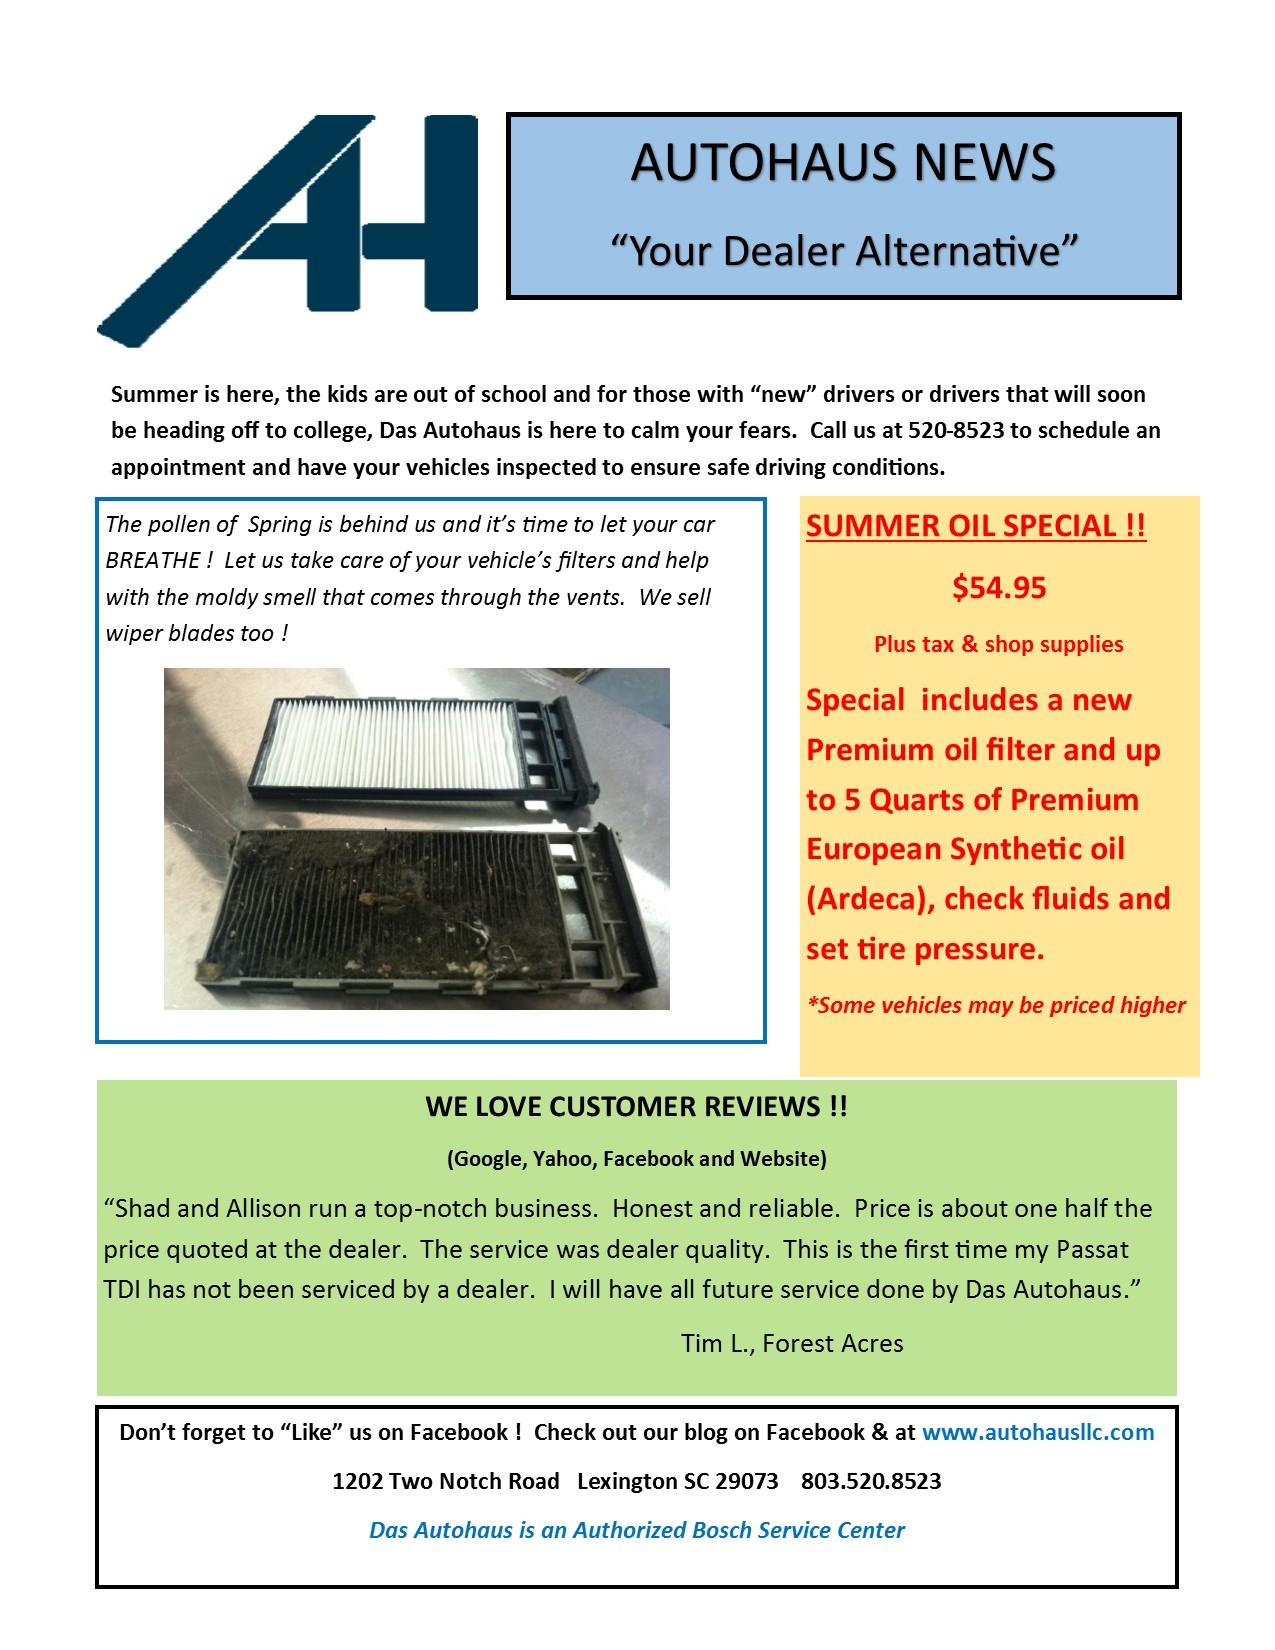 Autohaus News